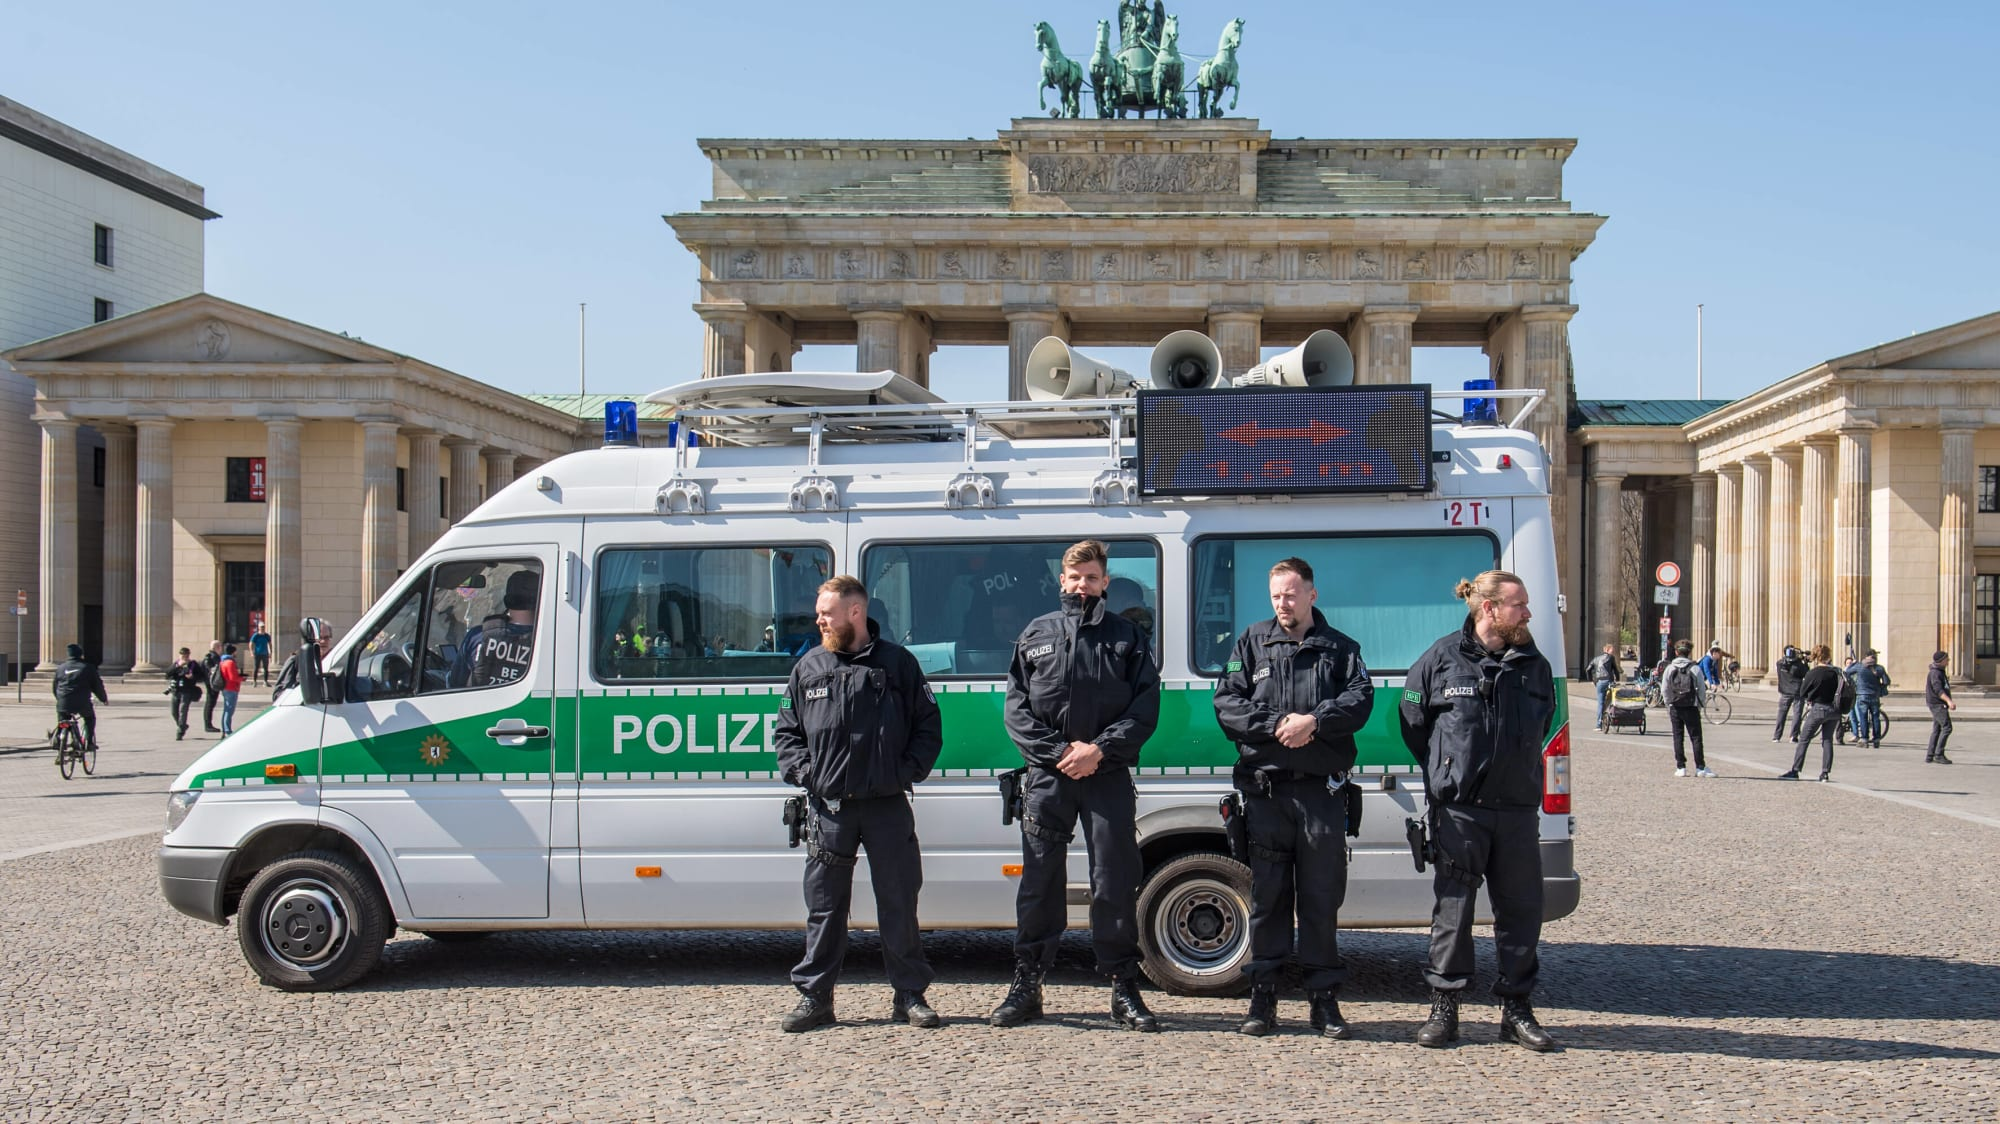 Polizisten vor dem Brandenburger Tor in Berlin